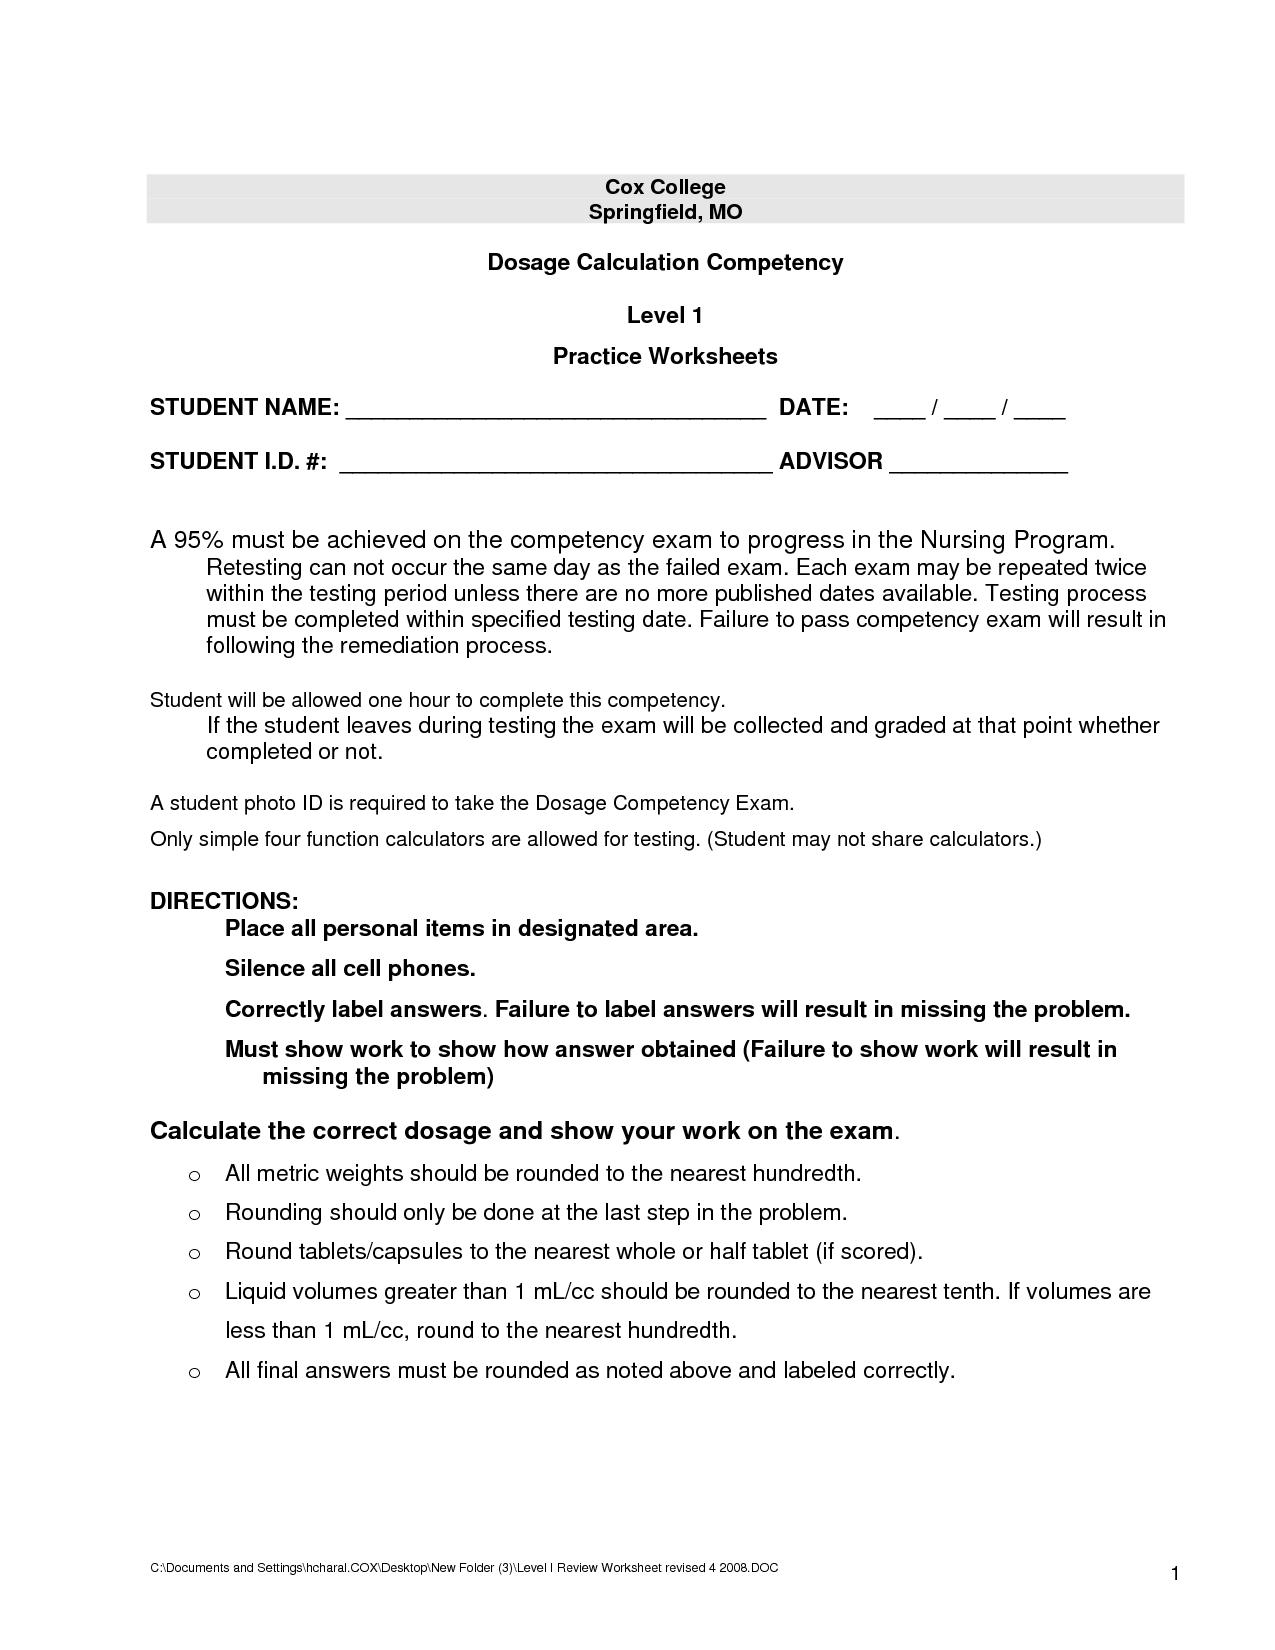 14 Best Images of Worksheets For Nursing Class  Dosage Calculation Practice Worksheets, Human